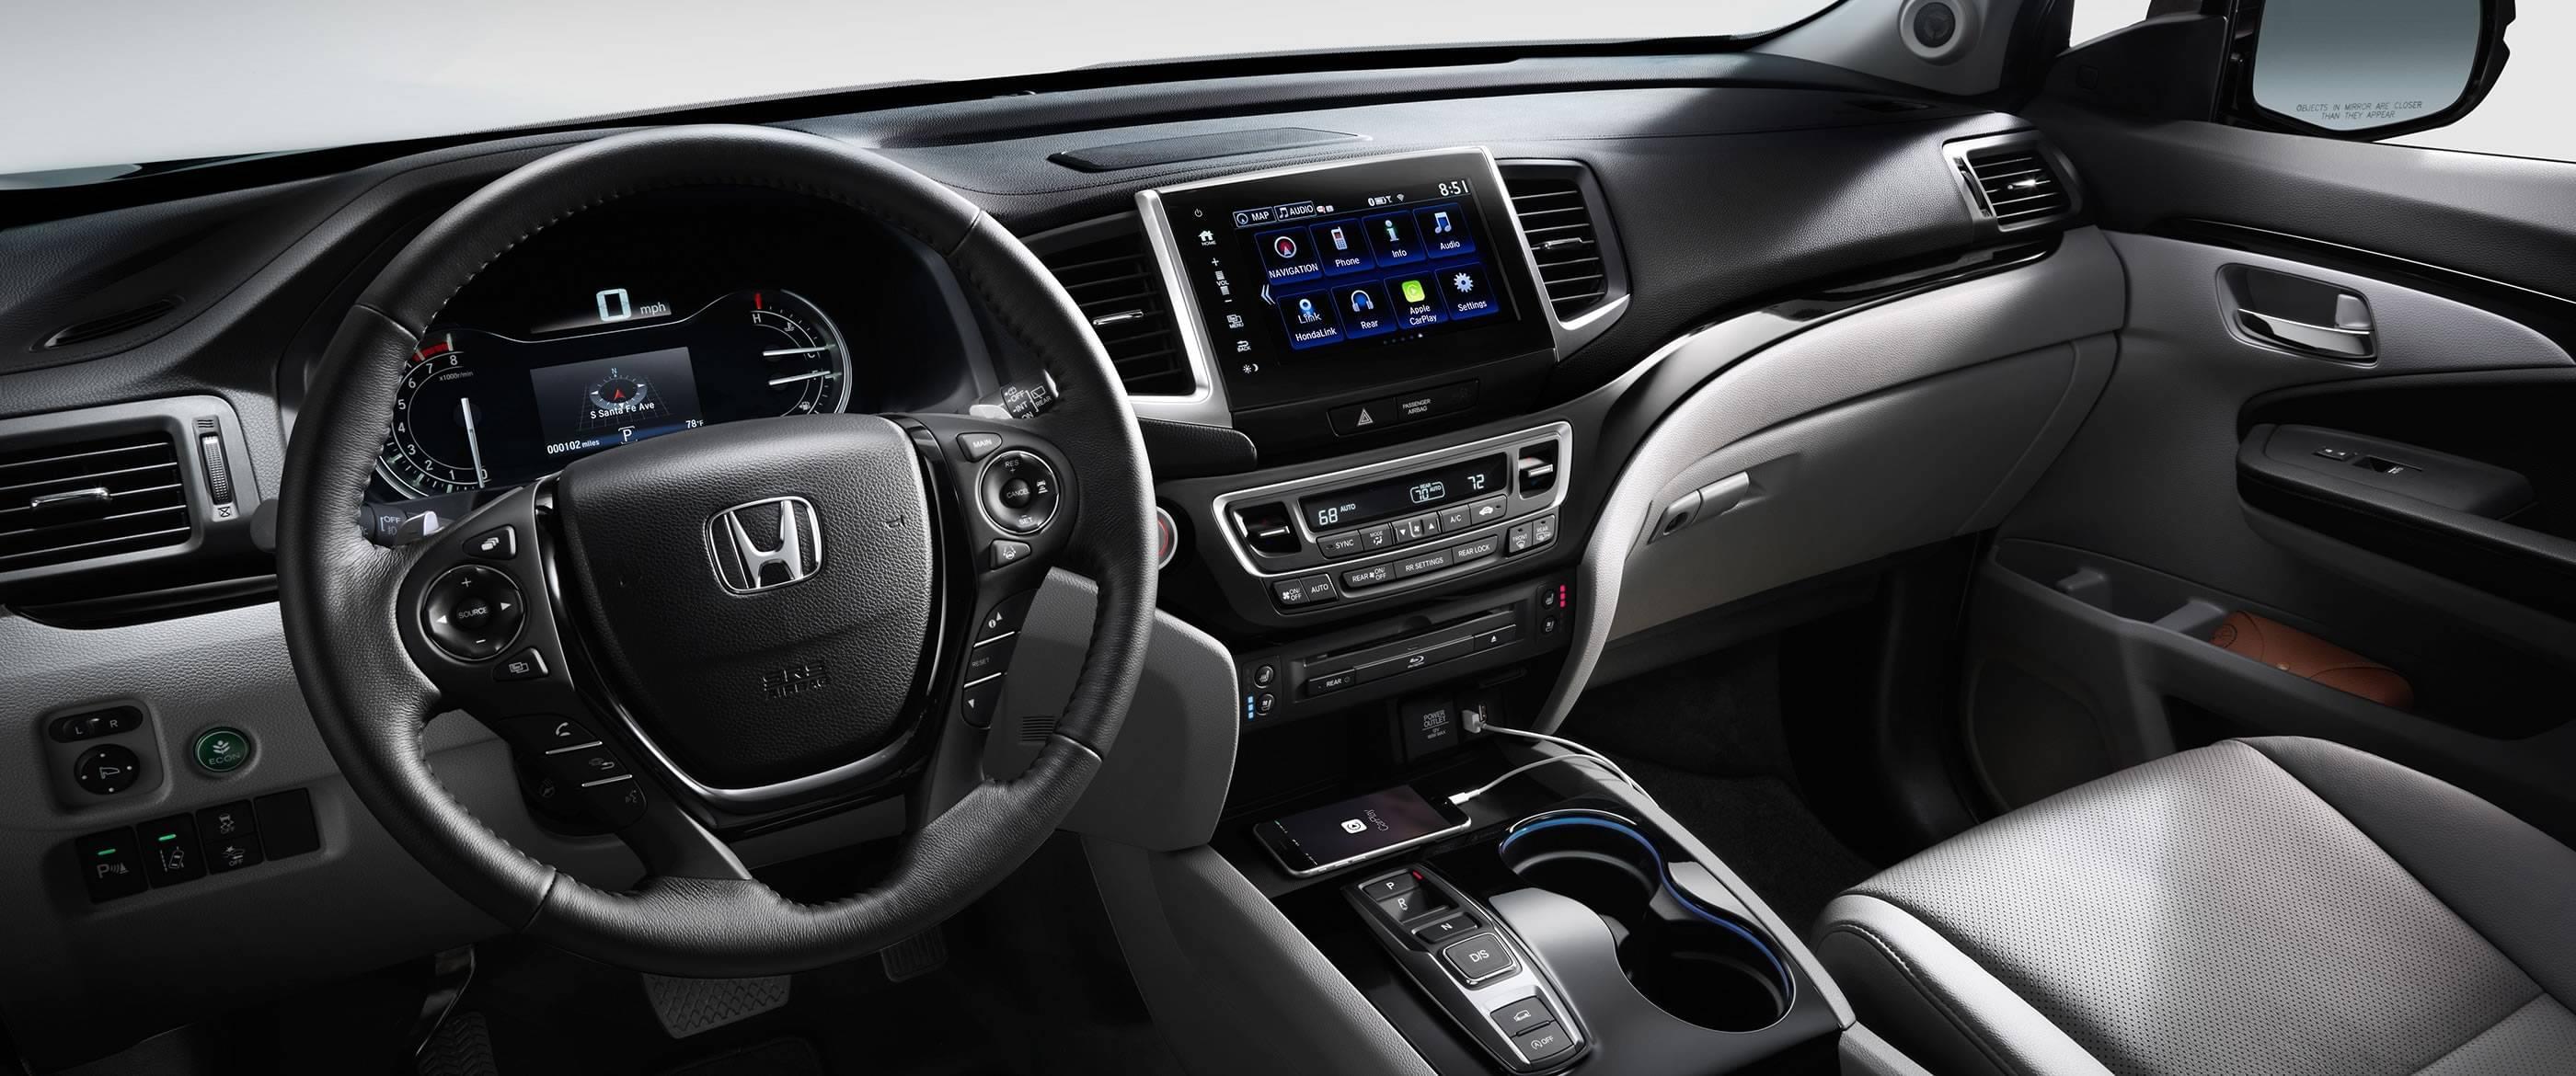 2017 Honda Pilot Interior Dash View